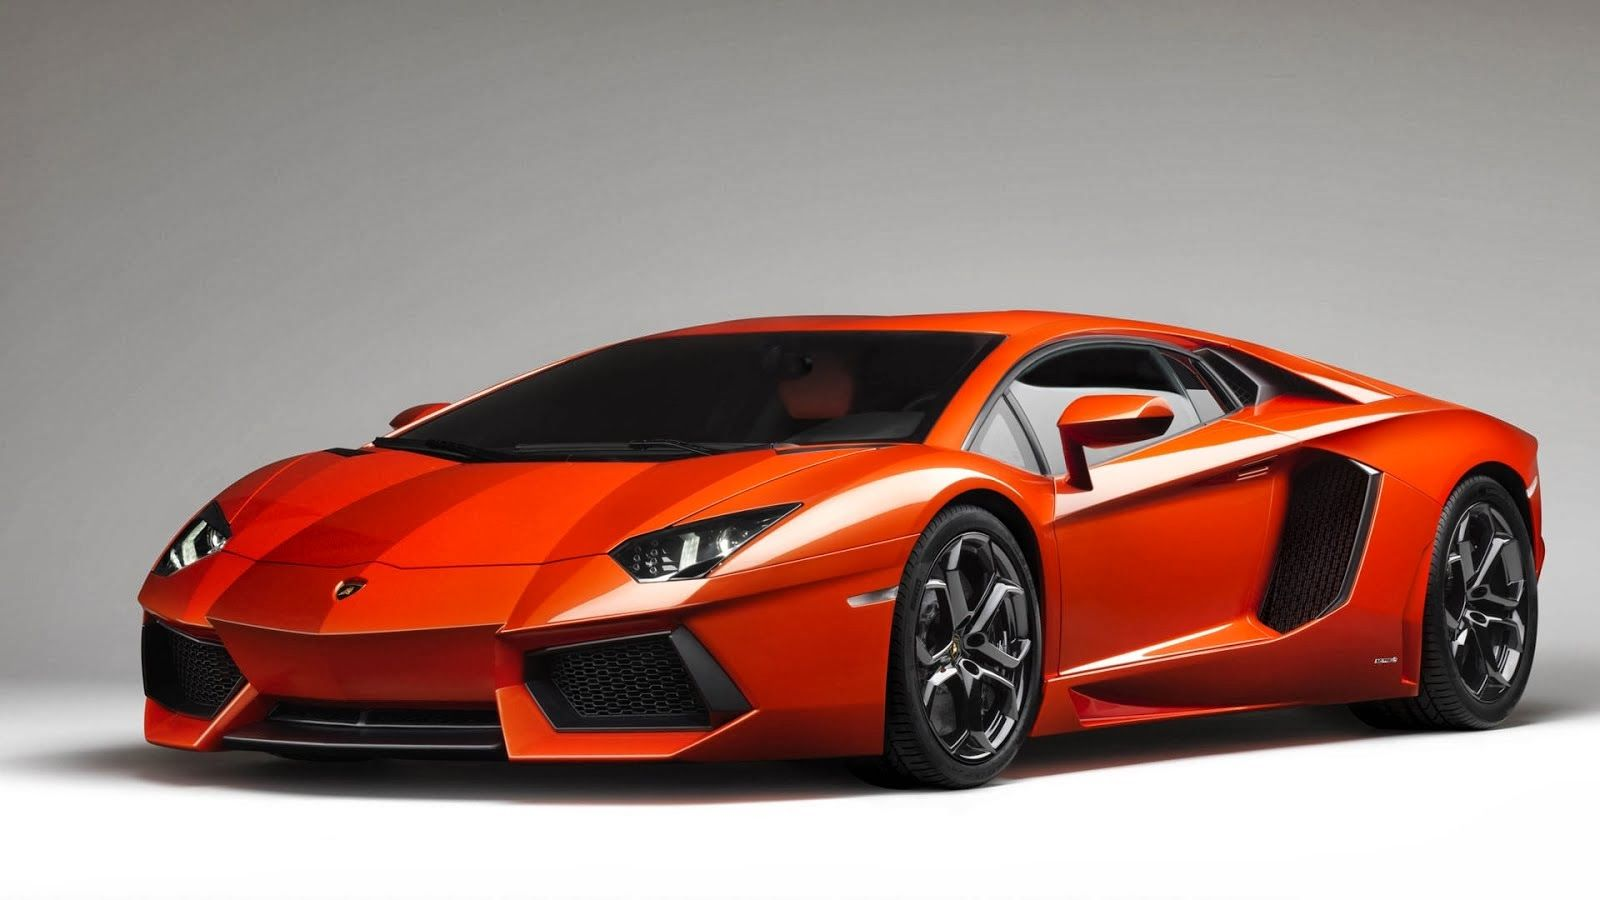 Cool Lamborghini Huracan Iphone Wallpaper Image Hd Orange